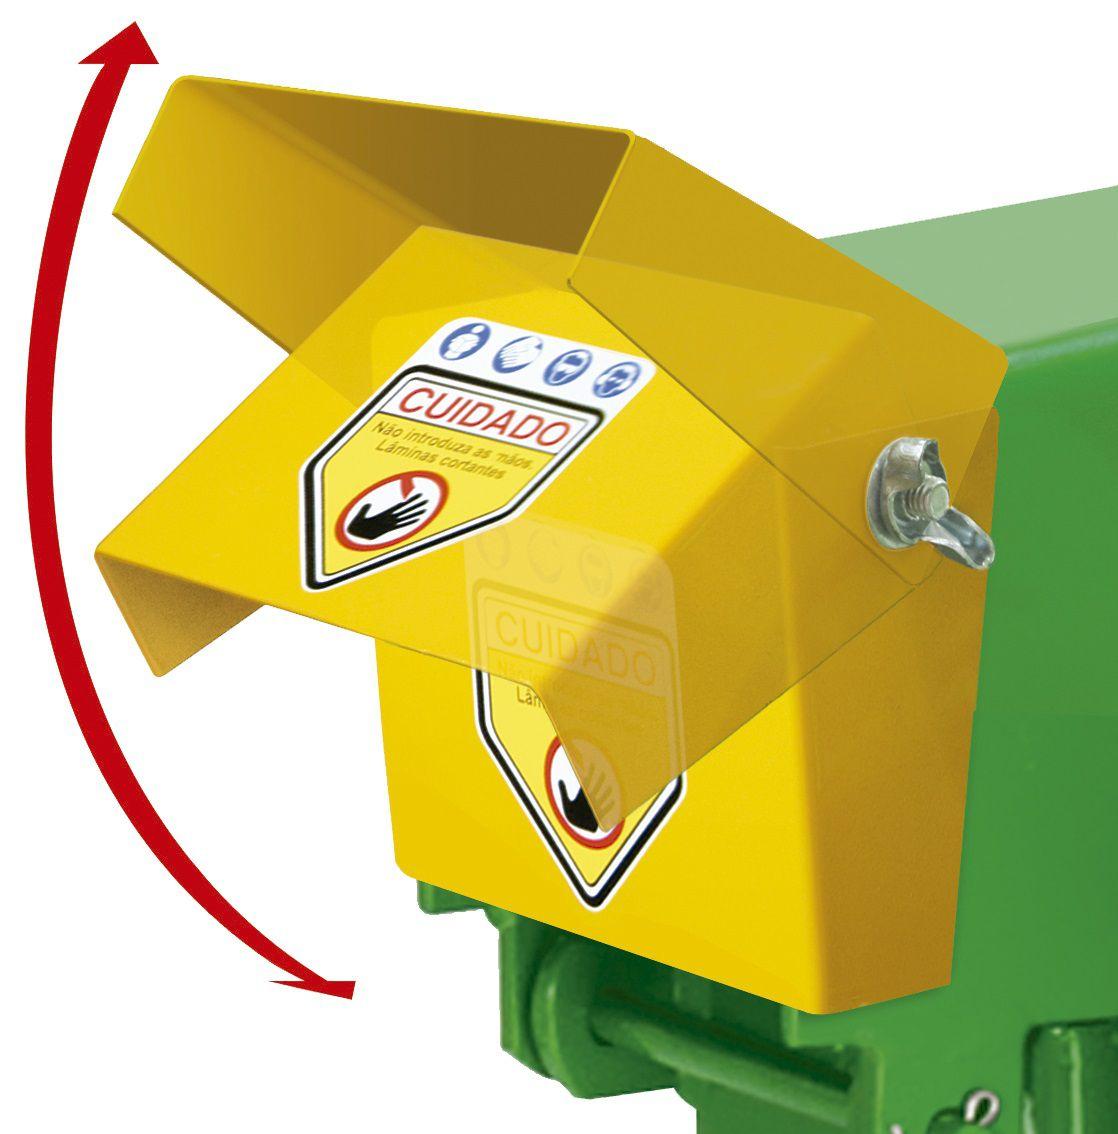 Triturador Forrageiro Acoplagem Trator S/ Motor Trapp TRF 600